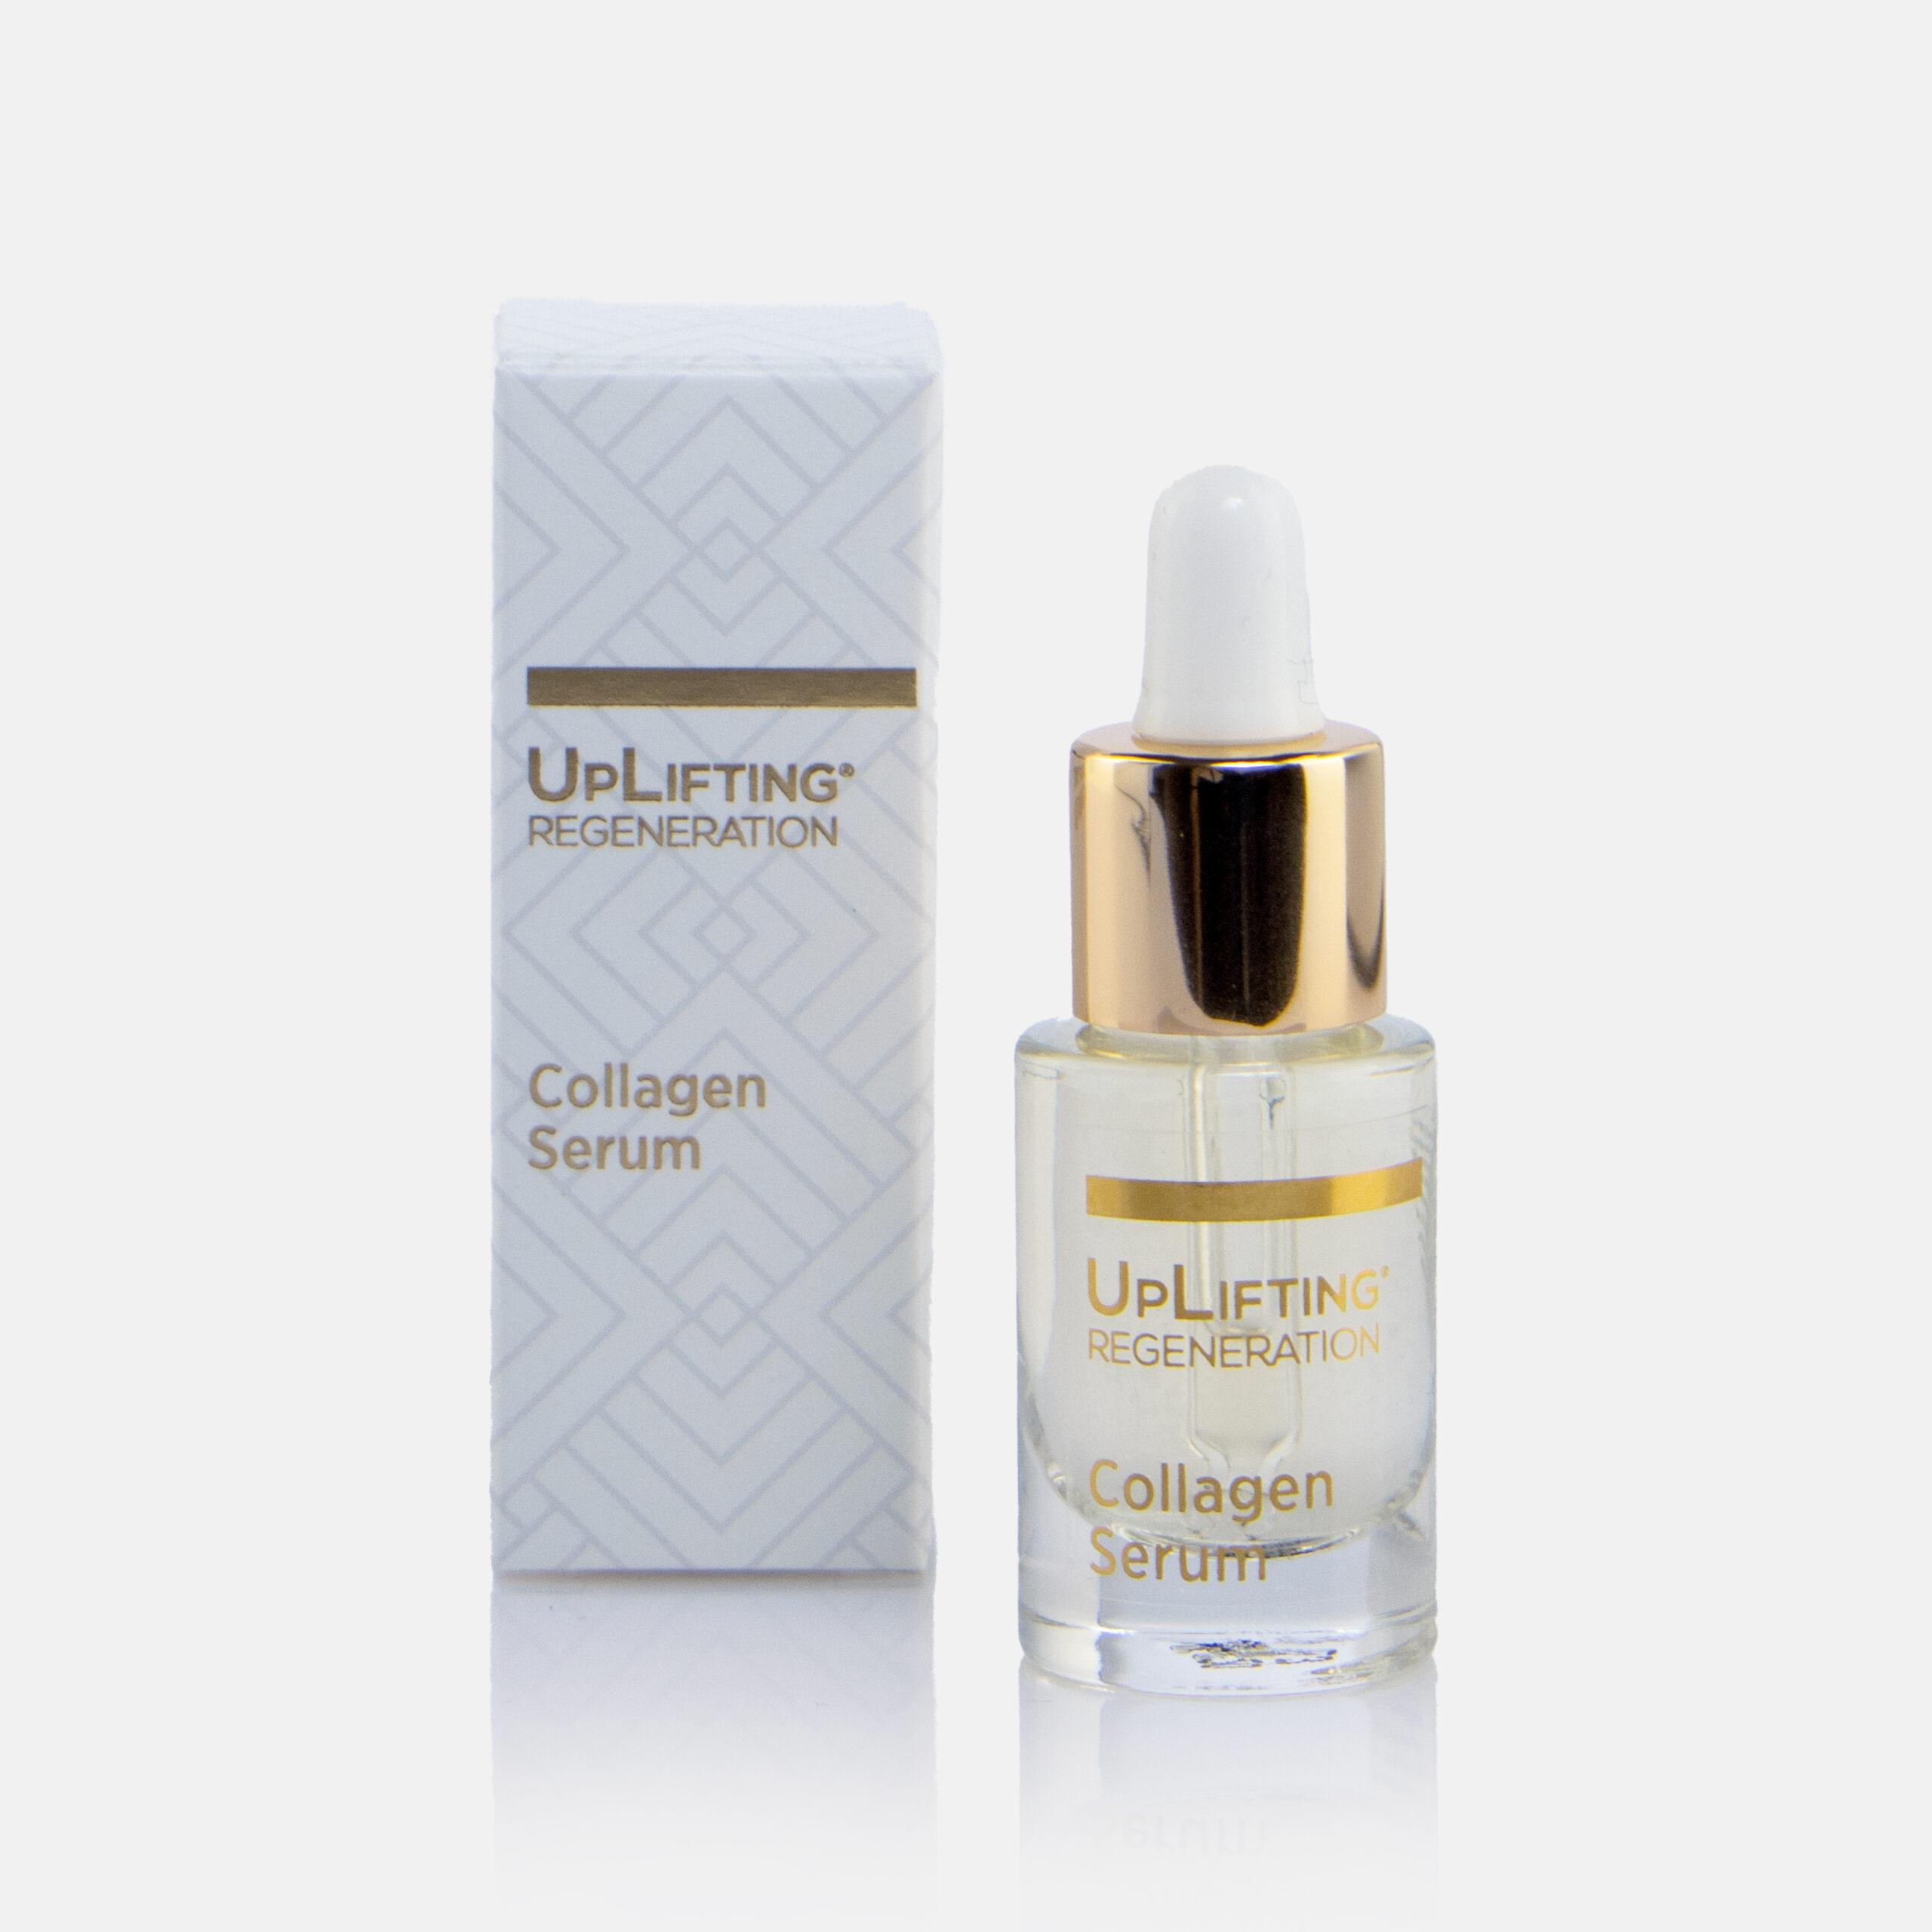 collagen-serum-mini-size